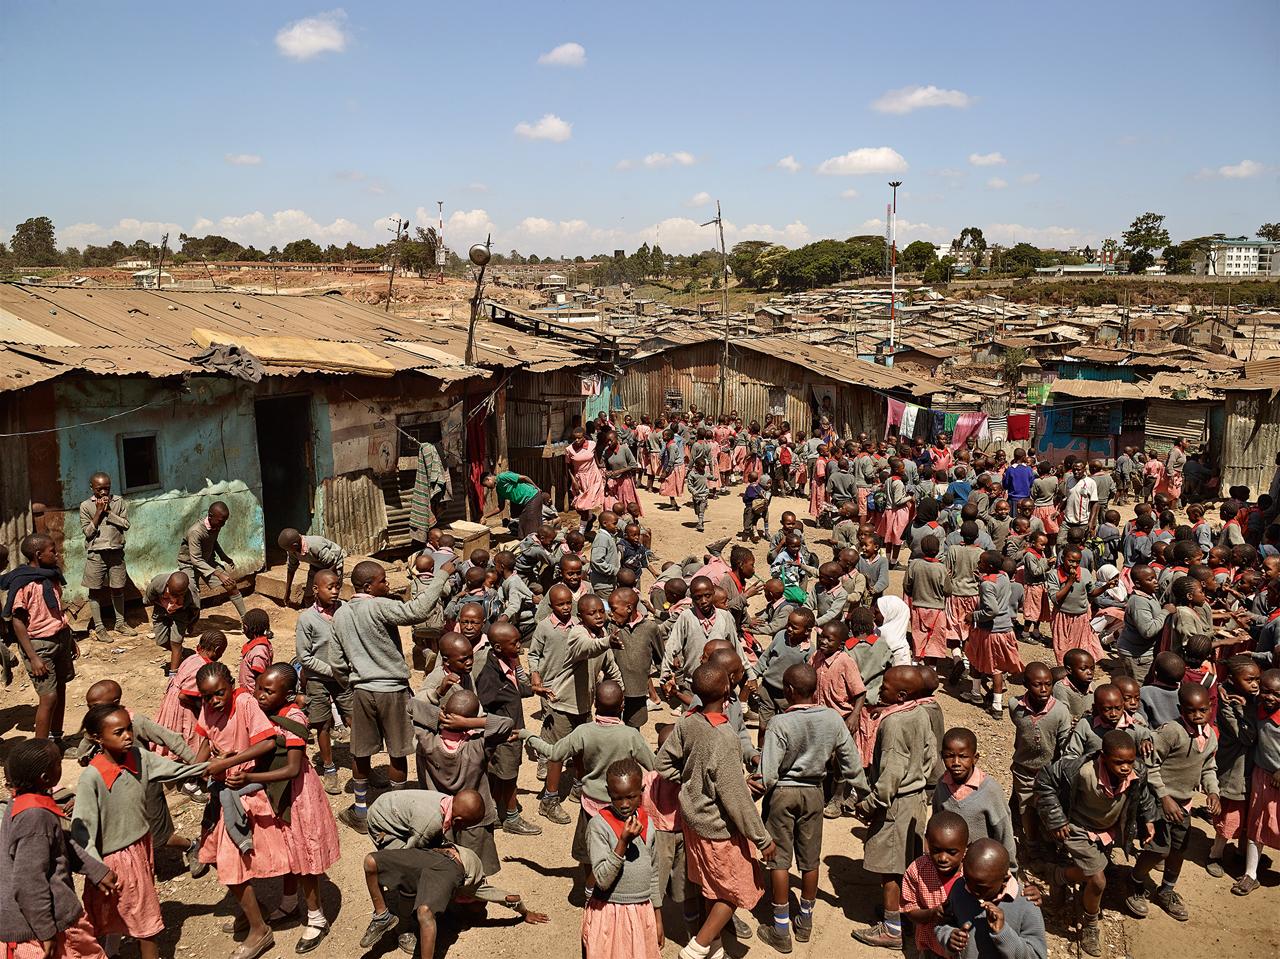 JAMES MOLLISON Valley View School, Nalvasha, Kenya, January 18, 2011